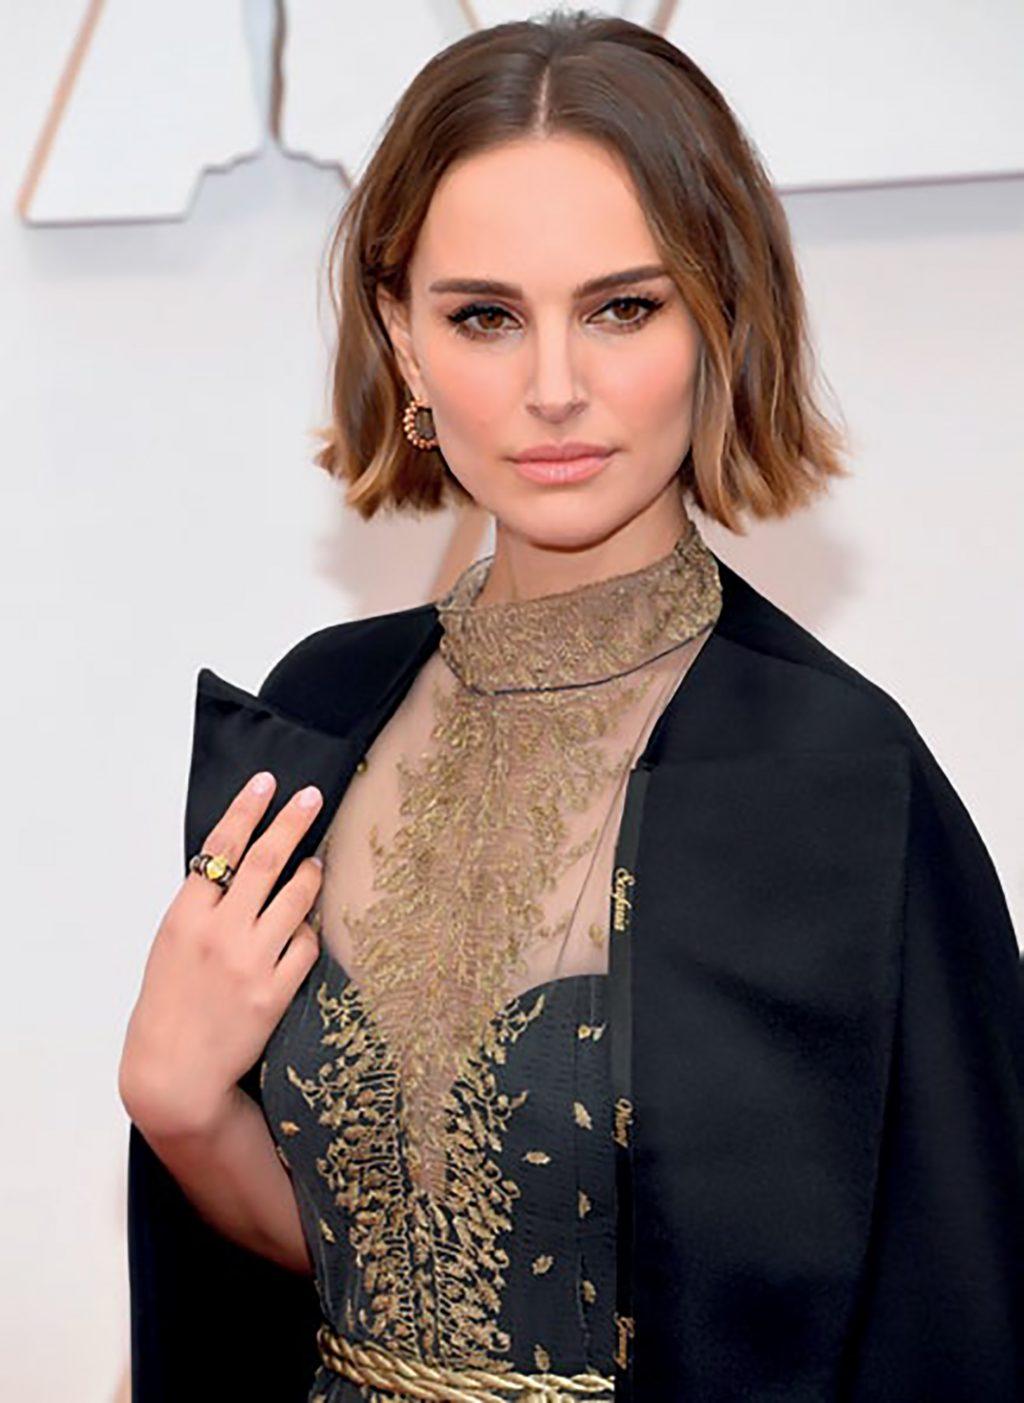 Natalie Portman cách làm đẹp của sao